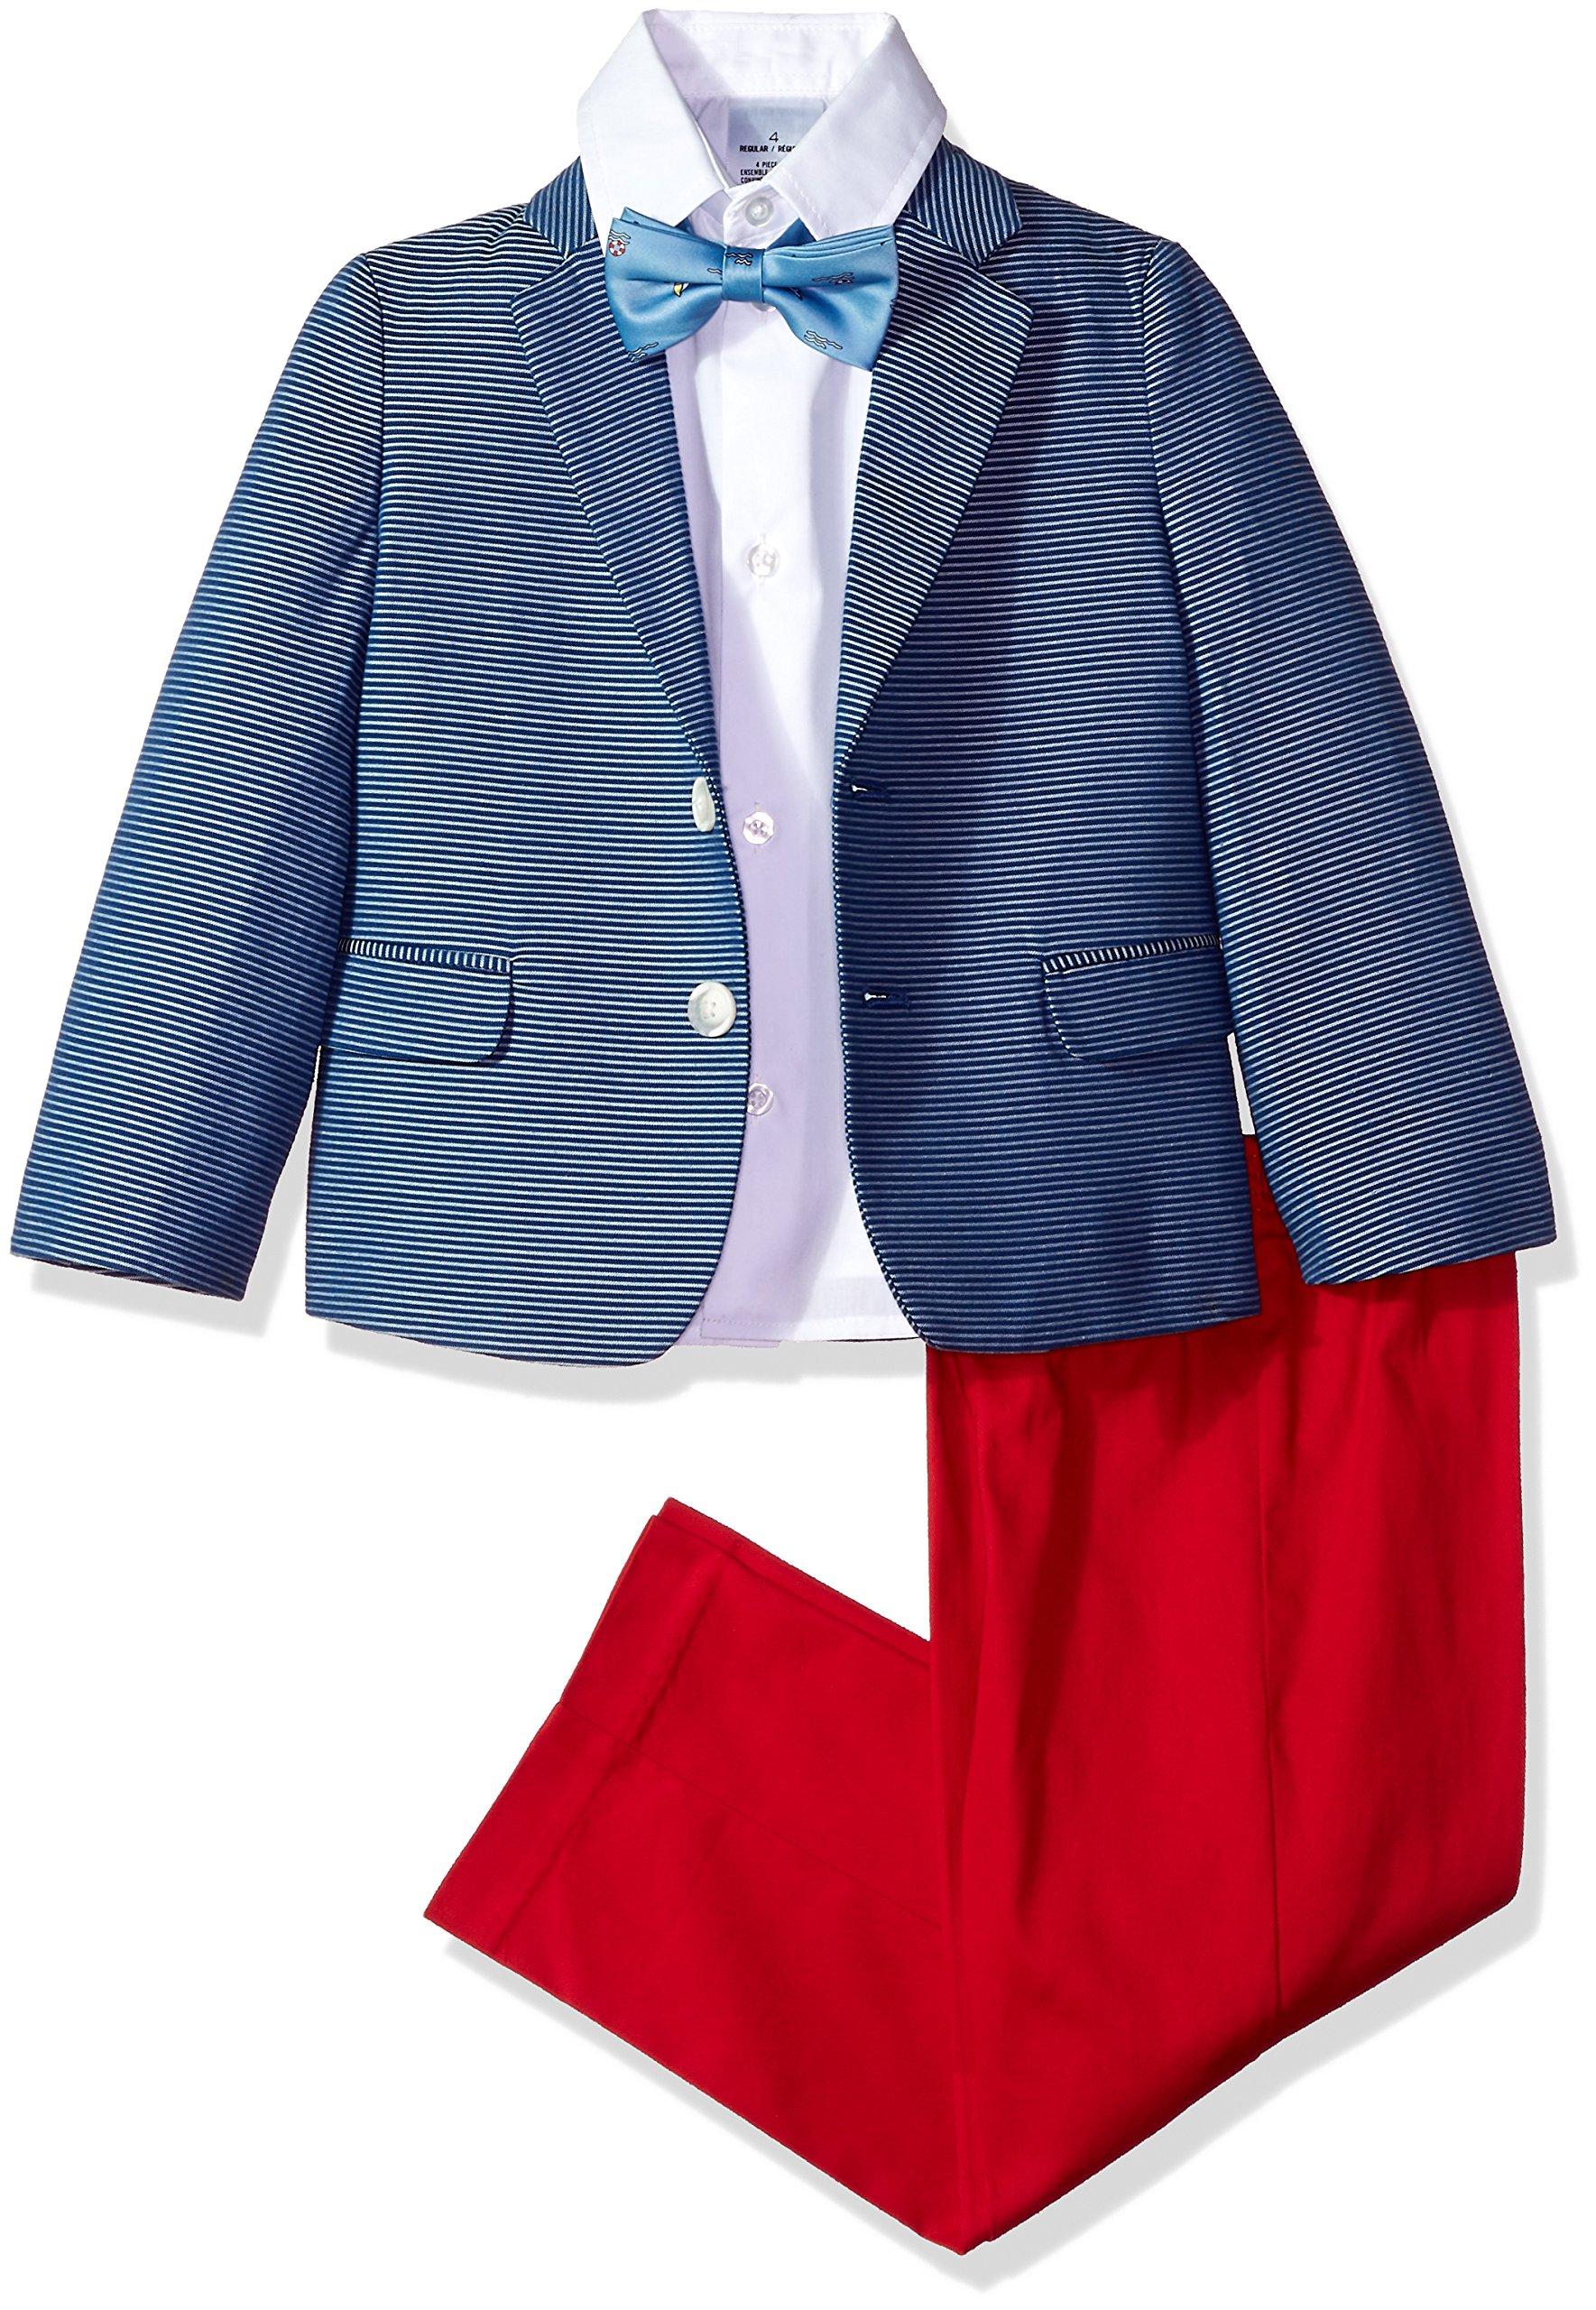 Nautica Boys' Little 4-Piece Formal Dresswear Suit Set, Horizontal Hope Diamond, 6